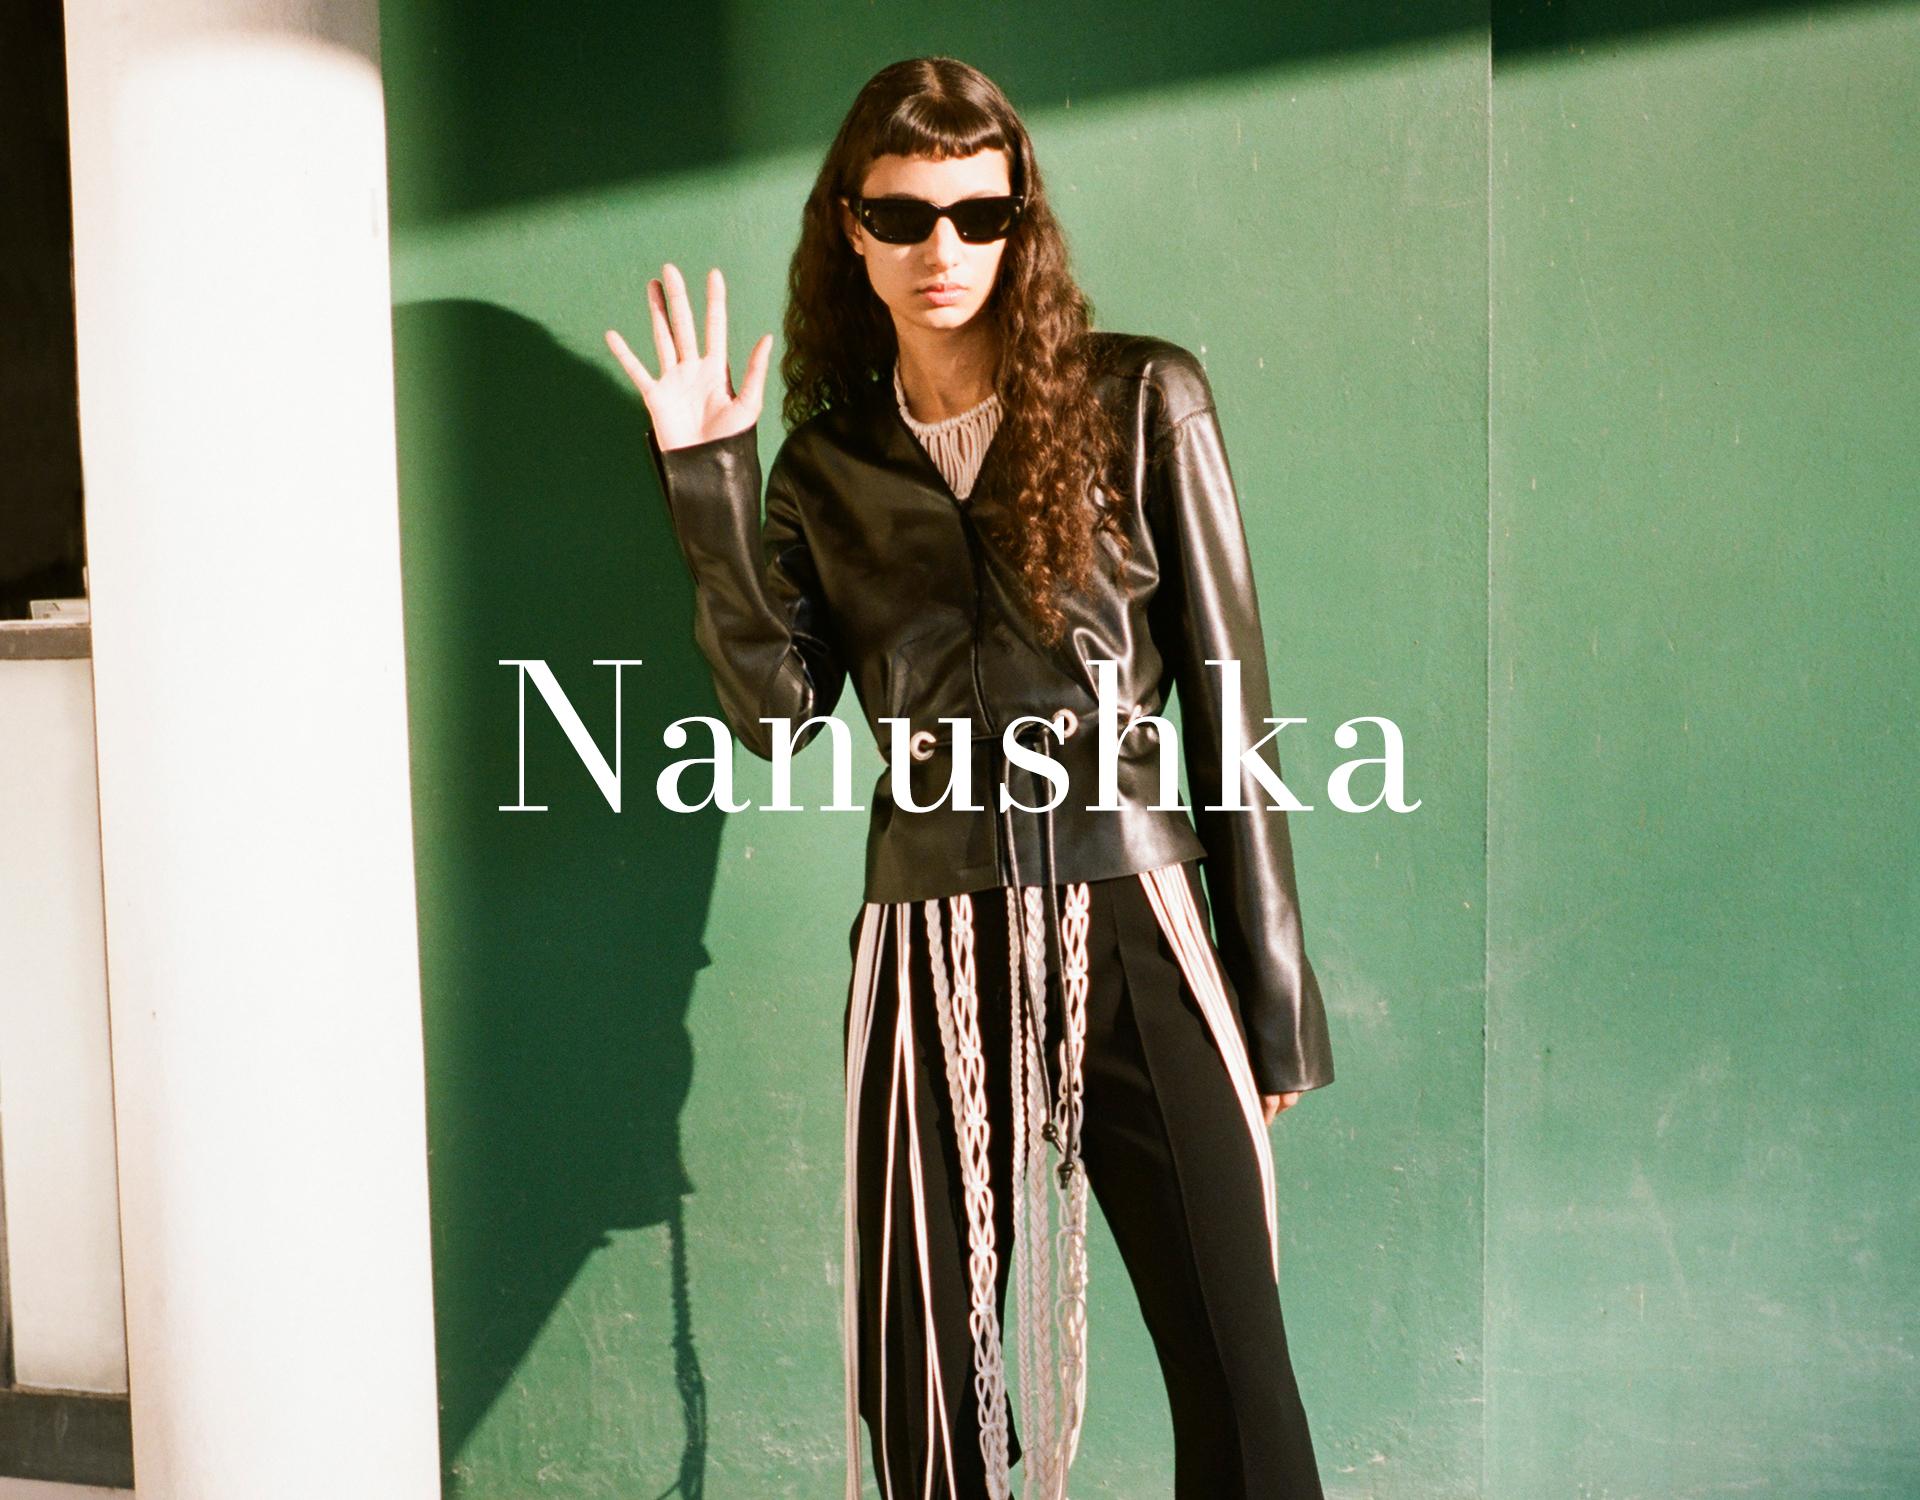 Nanushka Model trägt Sonnenbrille und schwarze Lederjacke